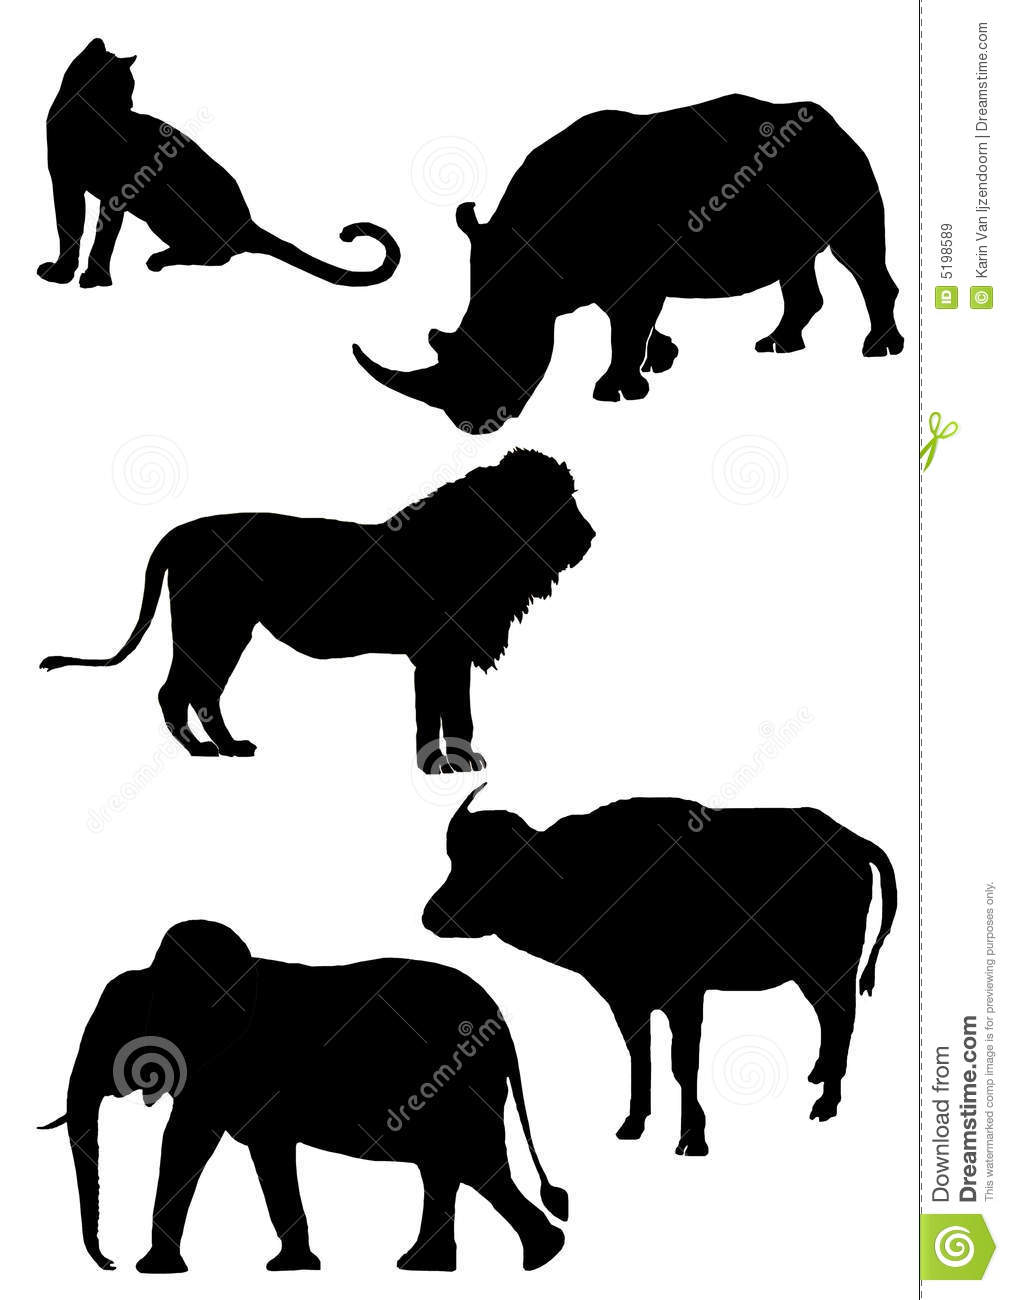 Animal clipart big 5 BIG Google Search SOLHOUETTE 5